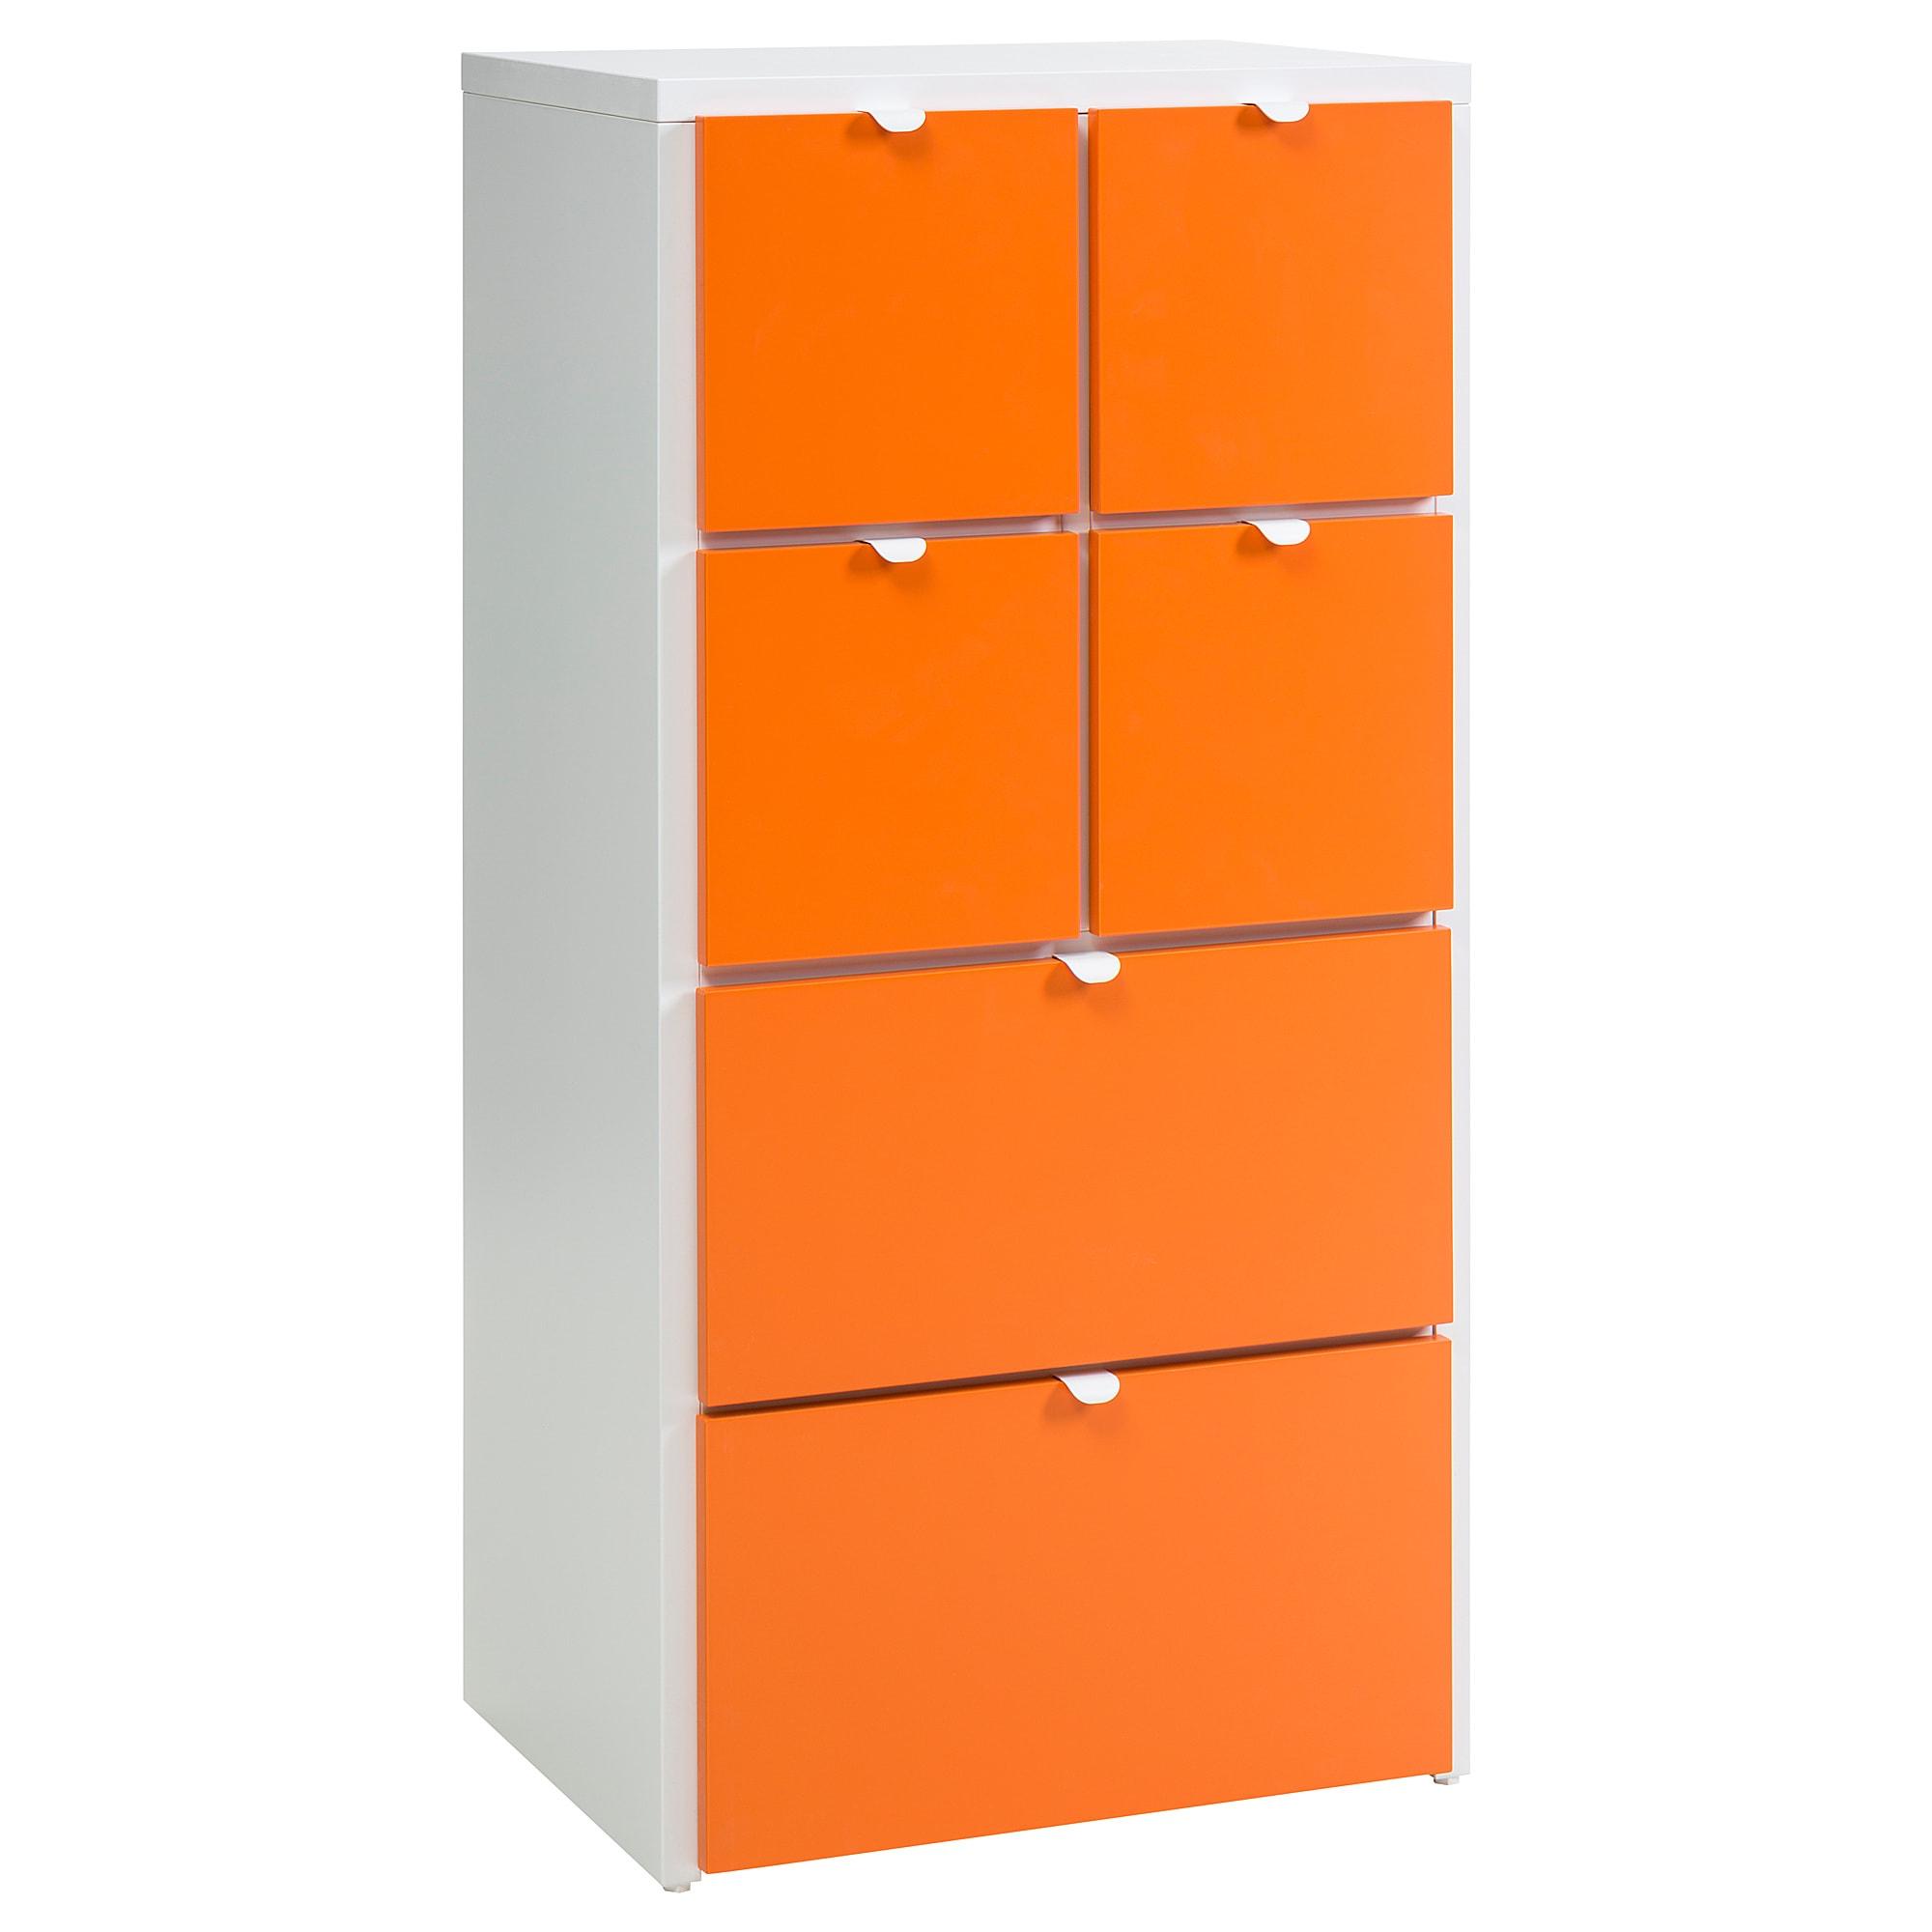 Muebles De Cajones Ikea Dddy CÃ Modas Pra Online Ikea